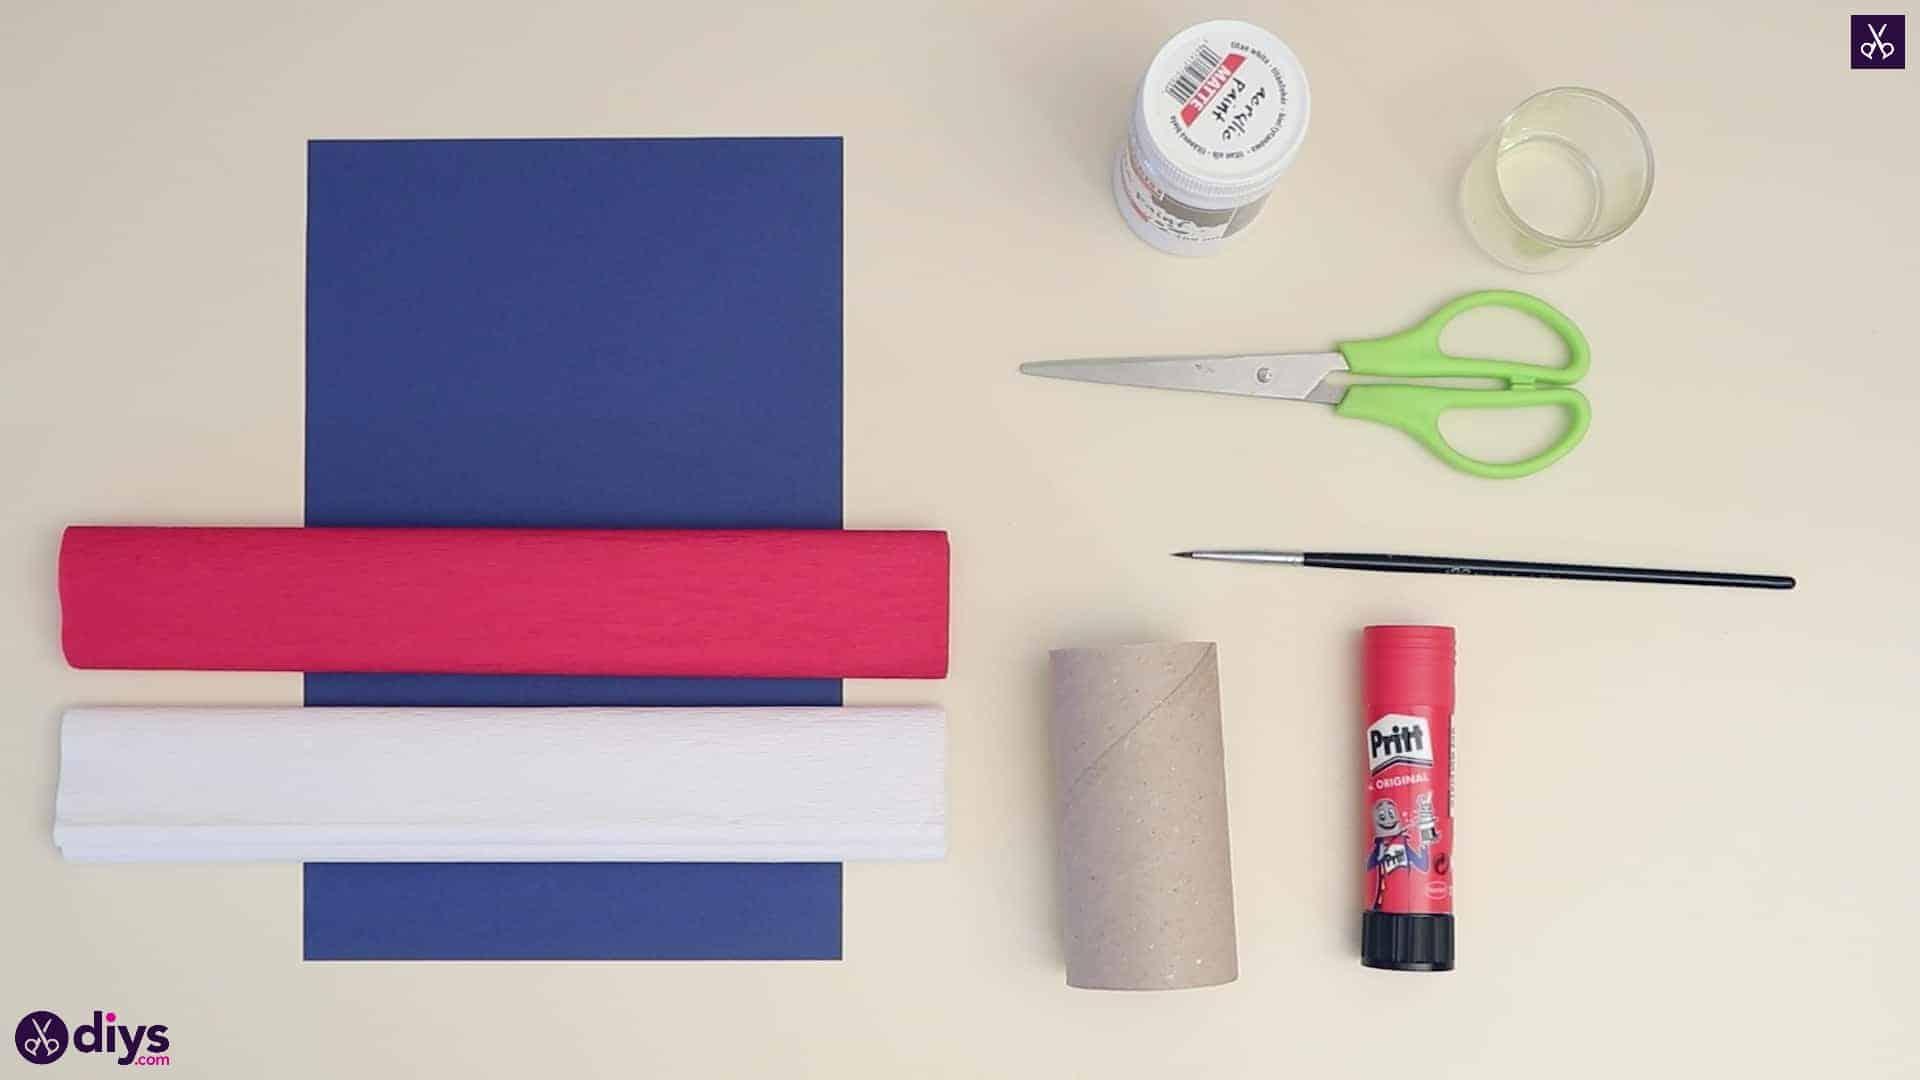 Toilet paper roll patriotic blower materials